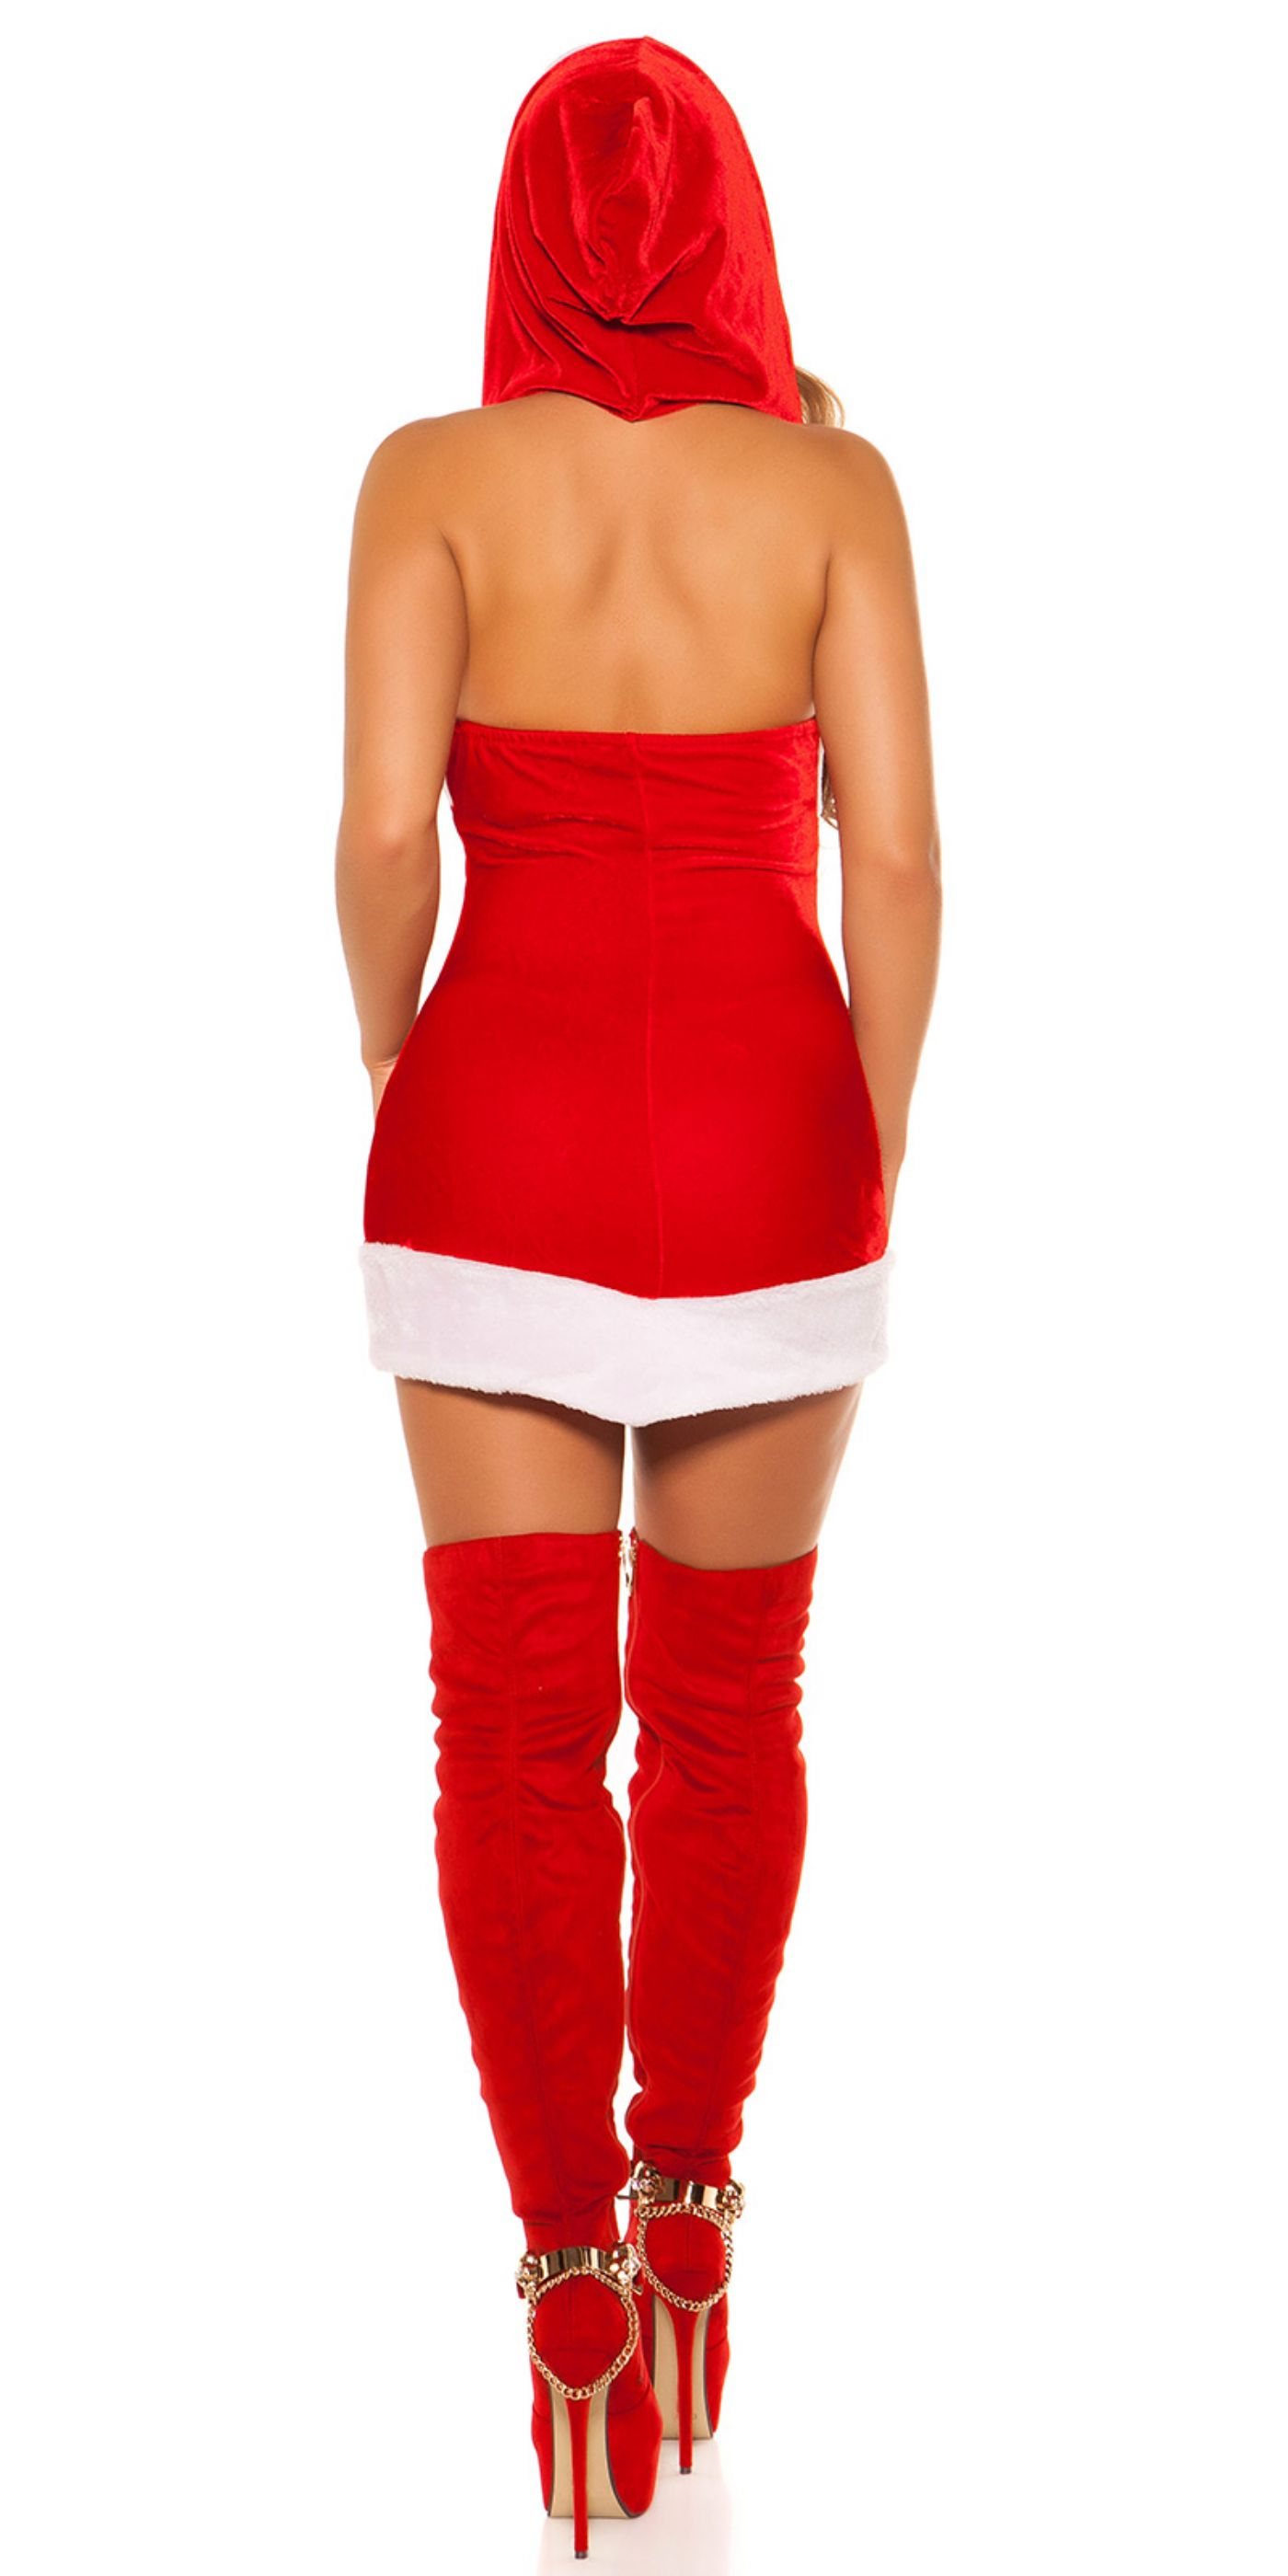 Julepige - Neck Minikjole / Hoodie